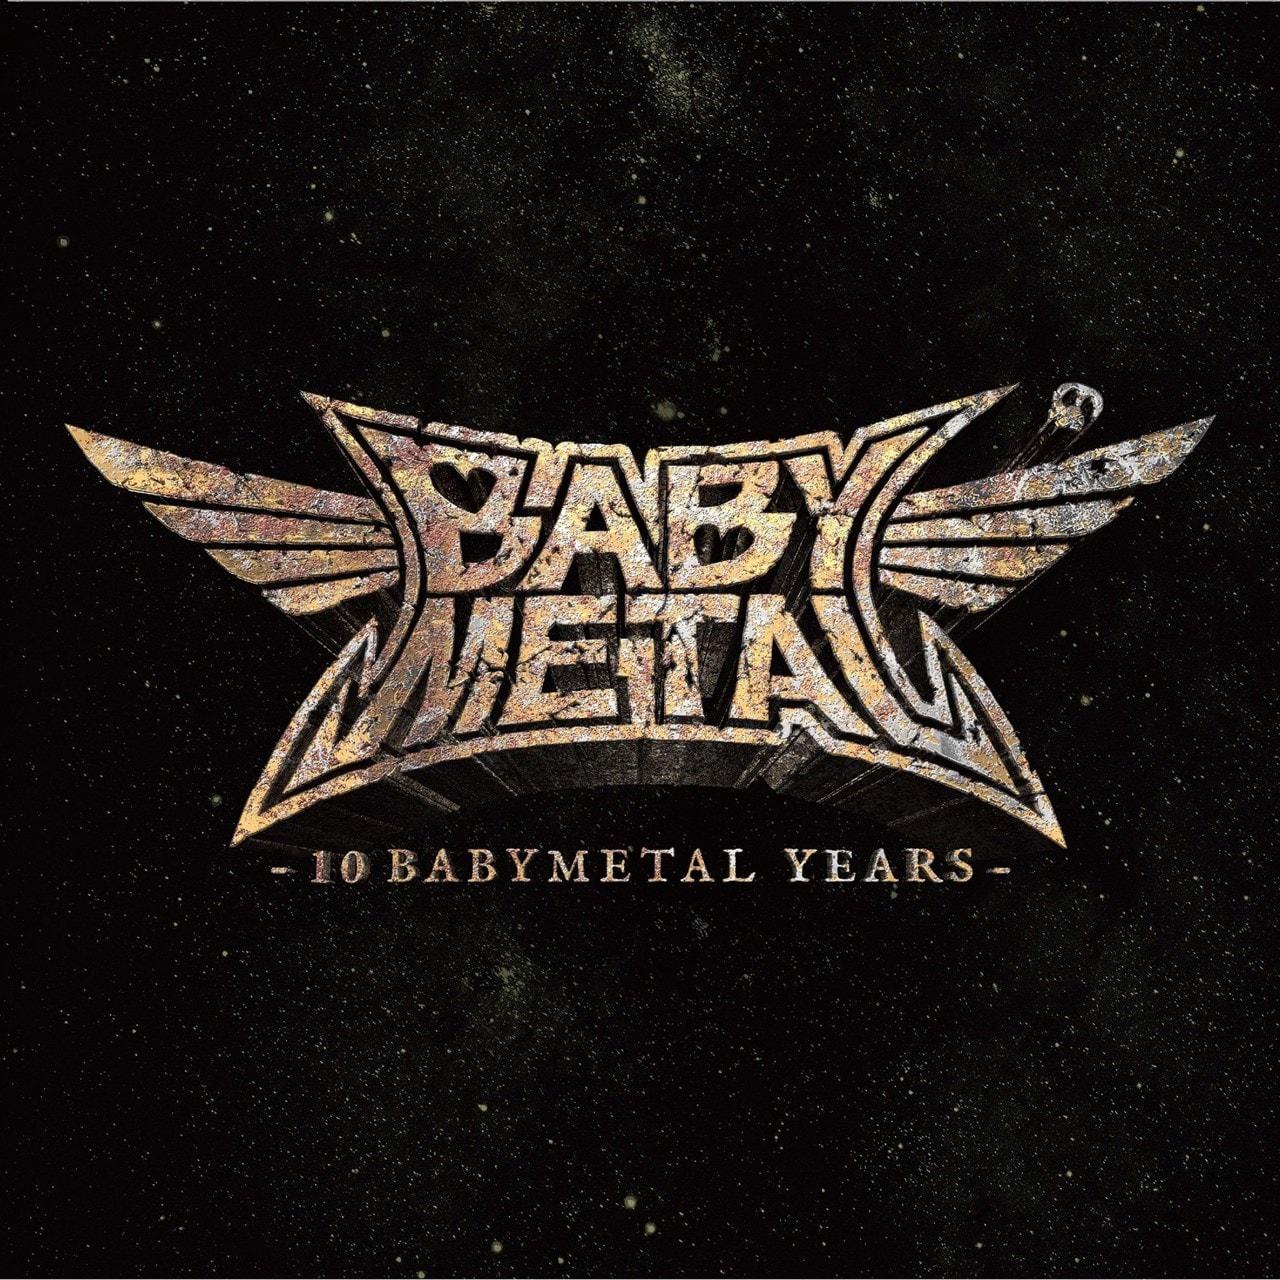 10 Babymetal Years - 1